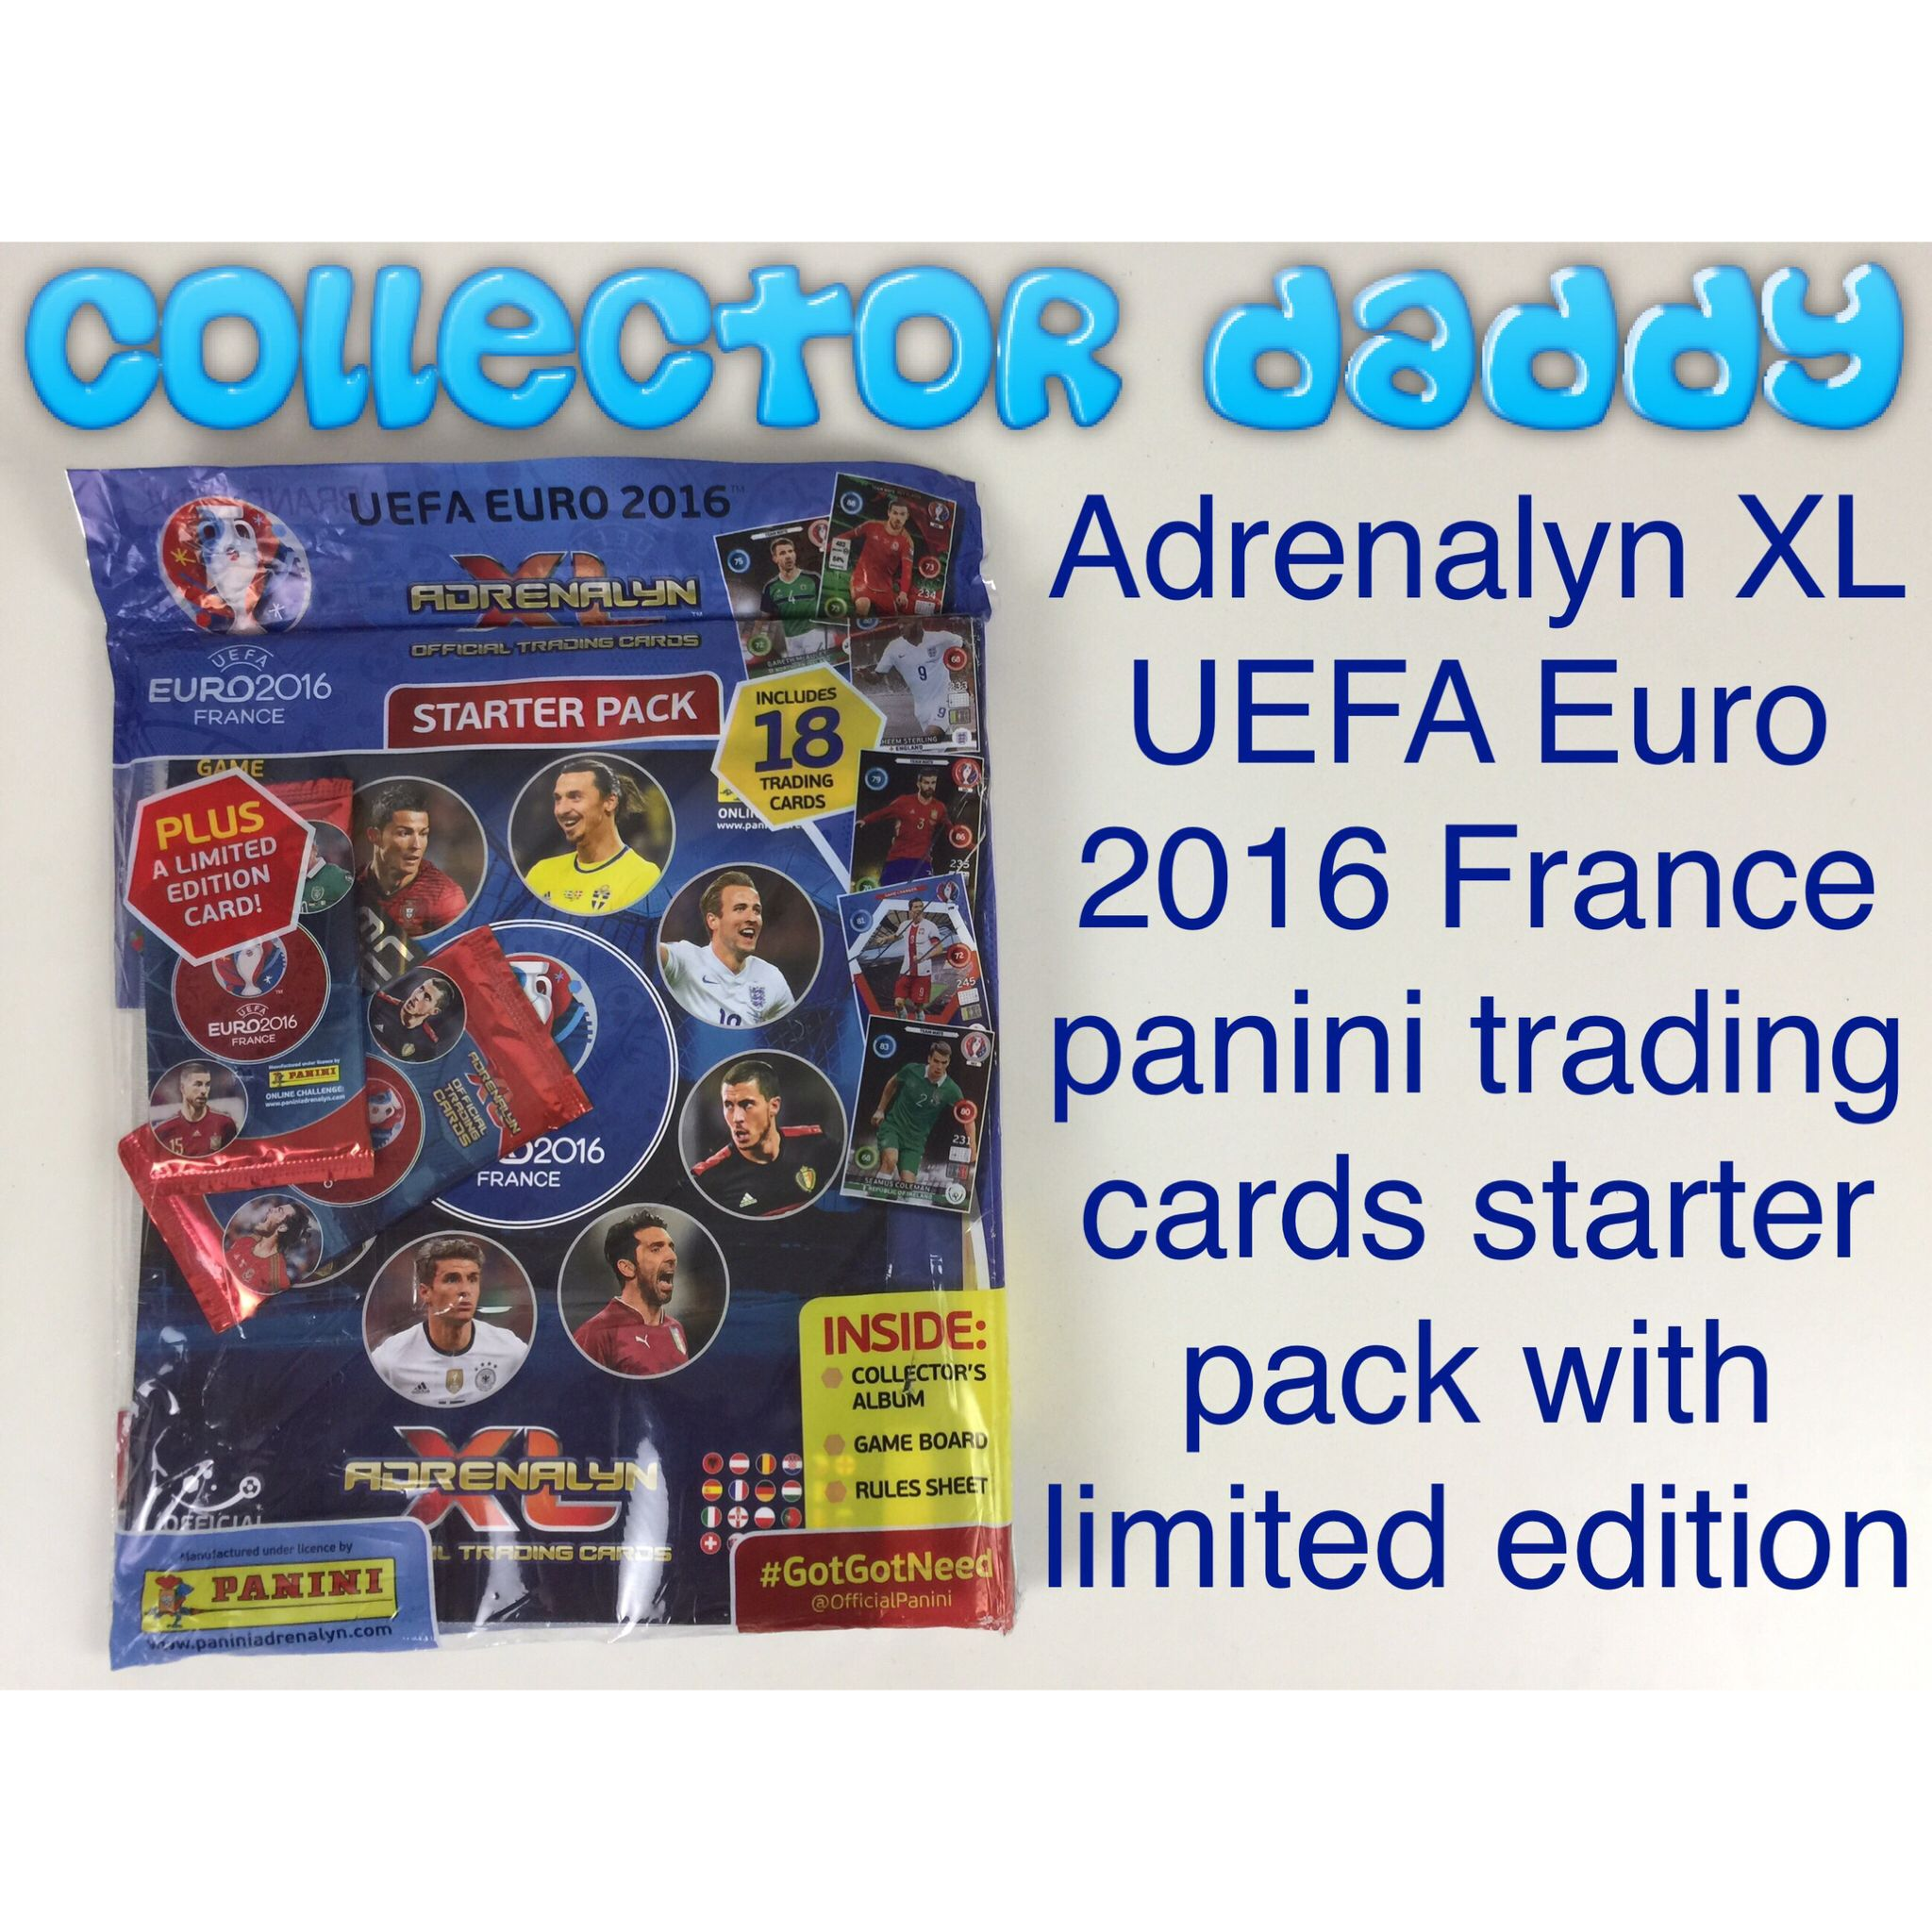 UEFA Euro 2016 France Adrenalyn XL panini trading cards